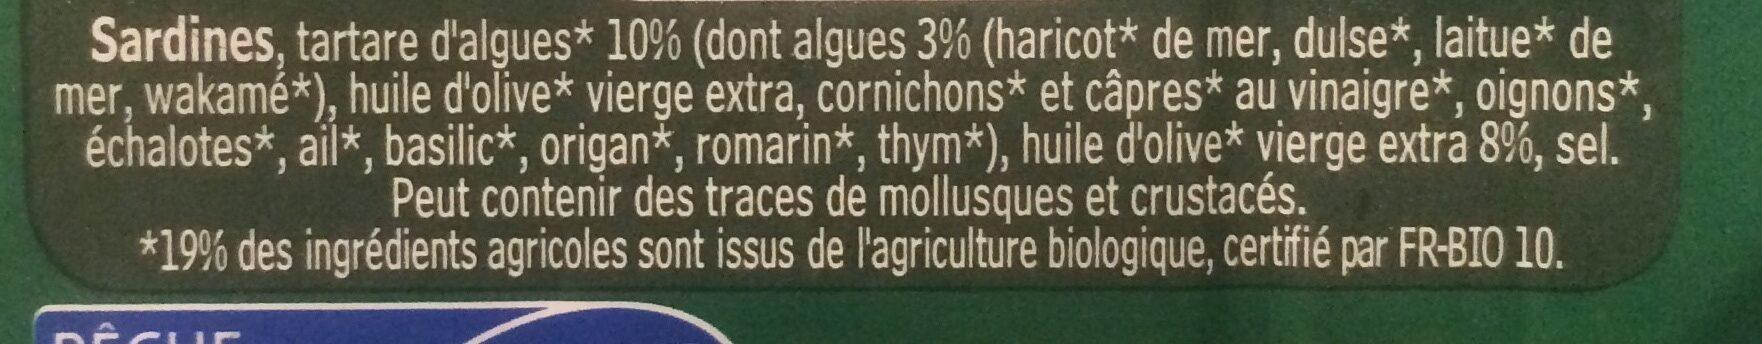 Sardines de Bretagne - Ingrédients - fr